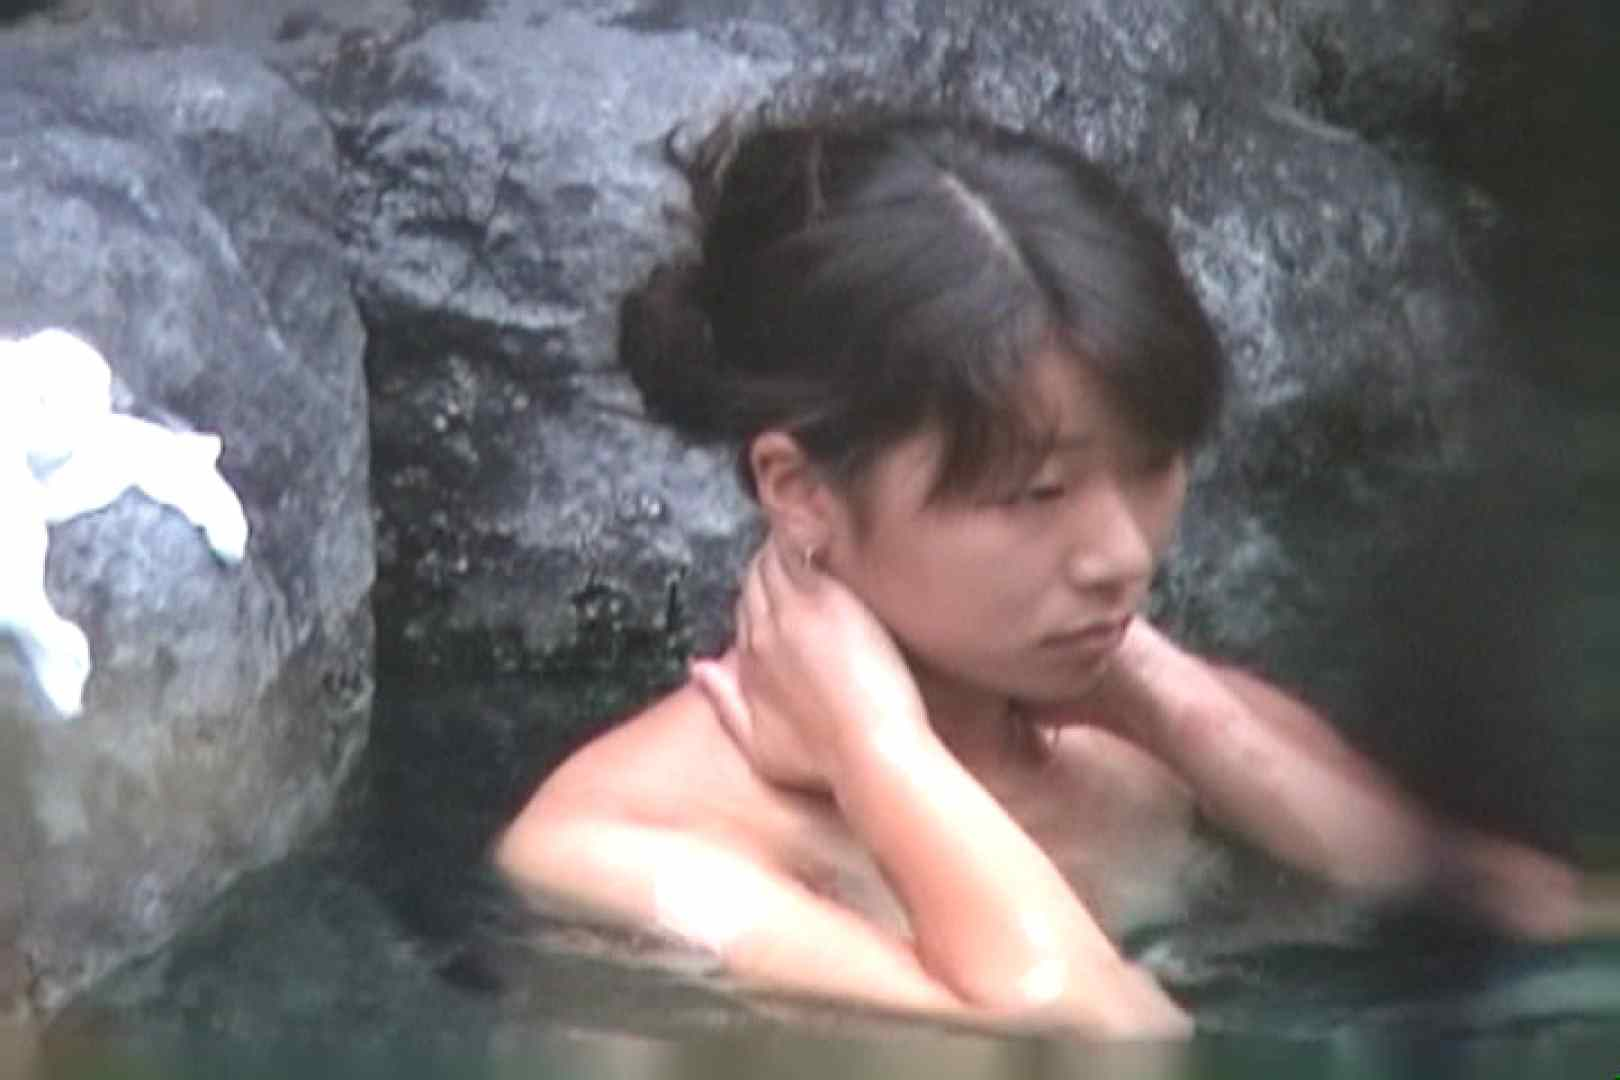 Aquaな露天風呂Vol.69【VIP限定】 OLのエロ生活   露天風呂  106連発 55